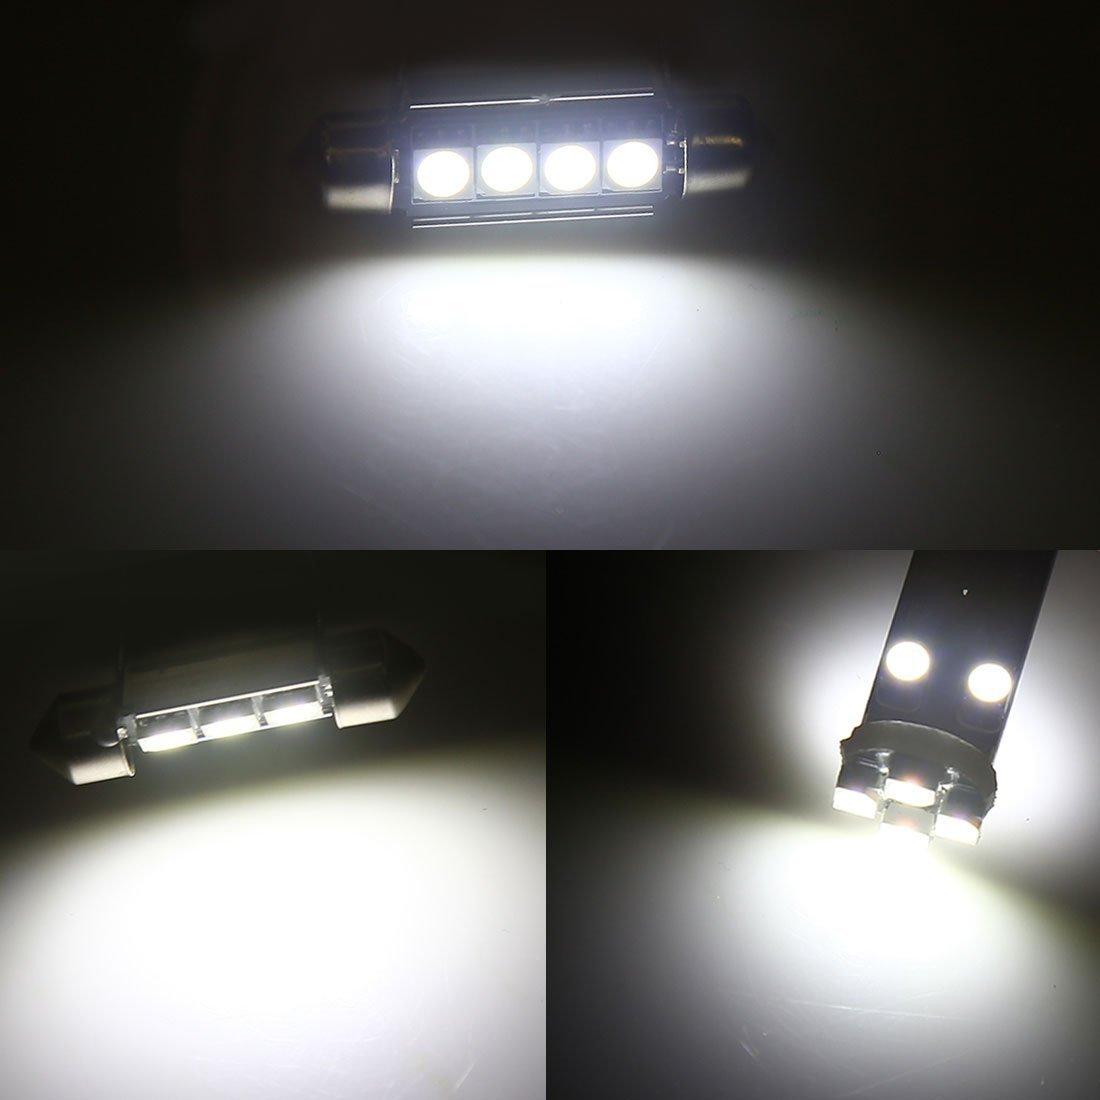 ETbotu 22pcs White Car Dome Map Reading LED Interior Light for BMW X5 E53 2001-2006 Canbus